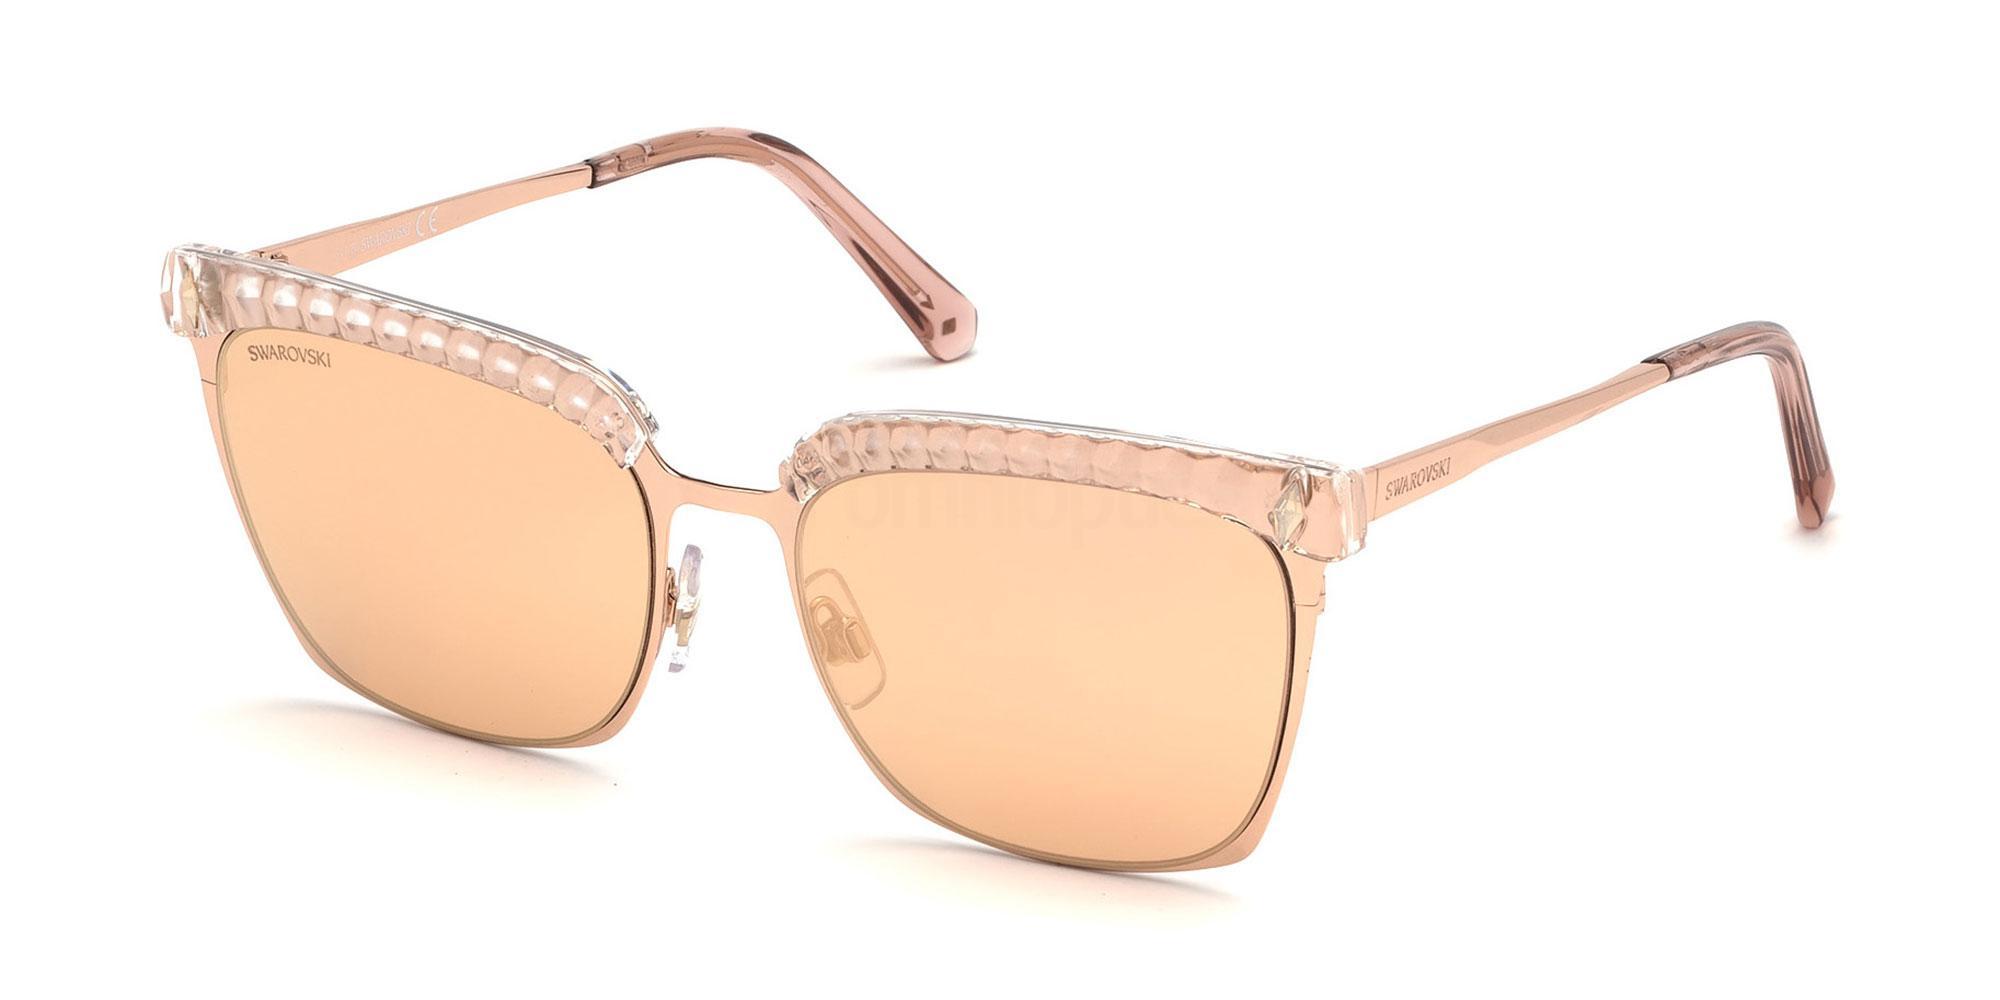 33G SK0196 Sunglasses, Swarovski